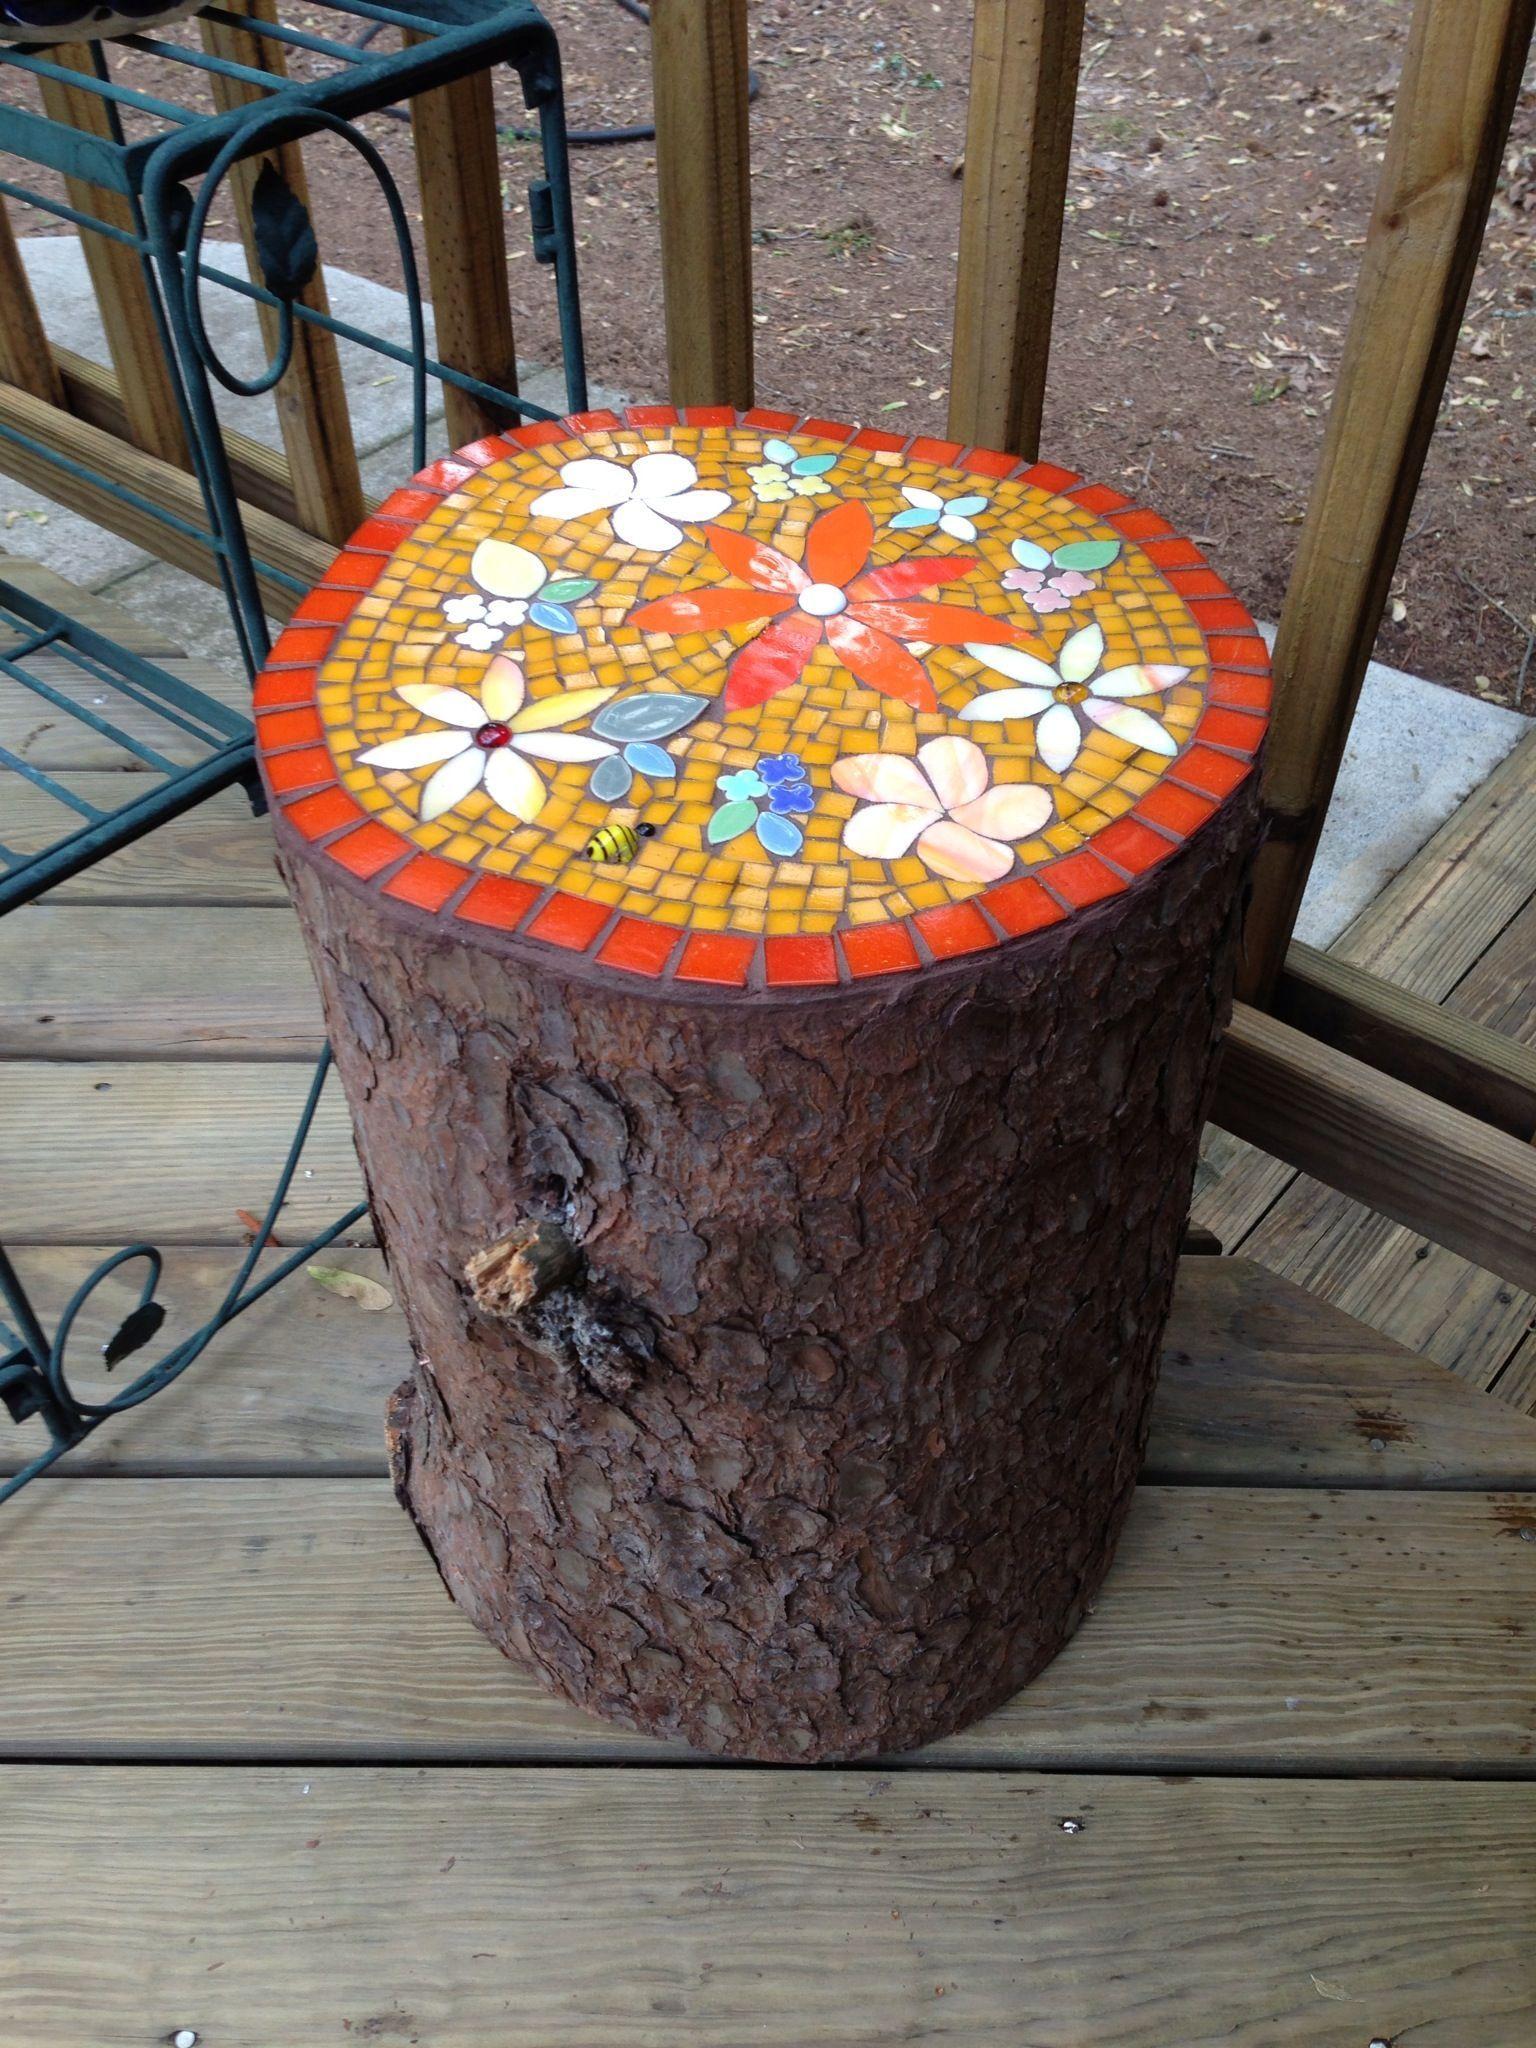 36 Inspiring Examples Of Repurposed Junk Garden Art Mosaic Diy Mosaic Crafts Mosaic Art